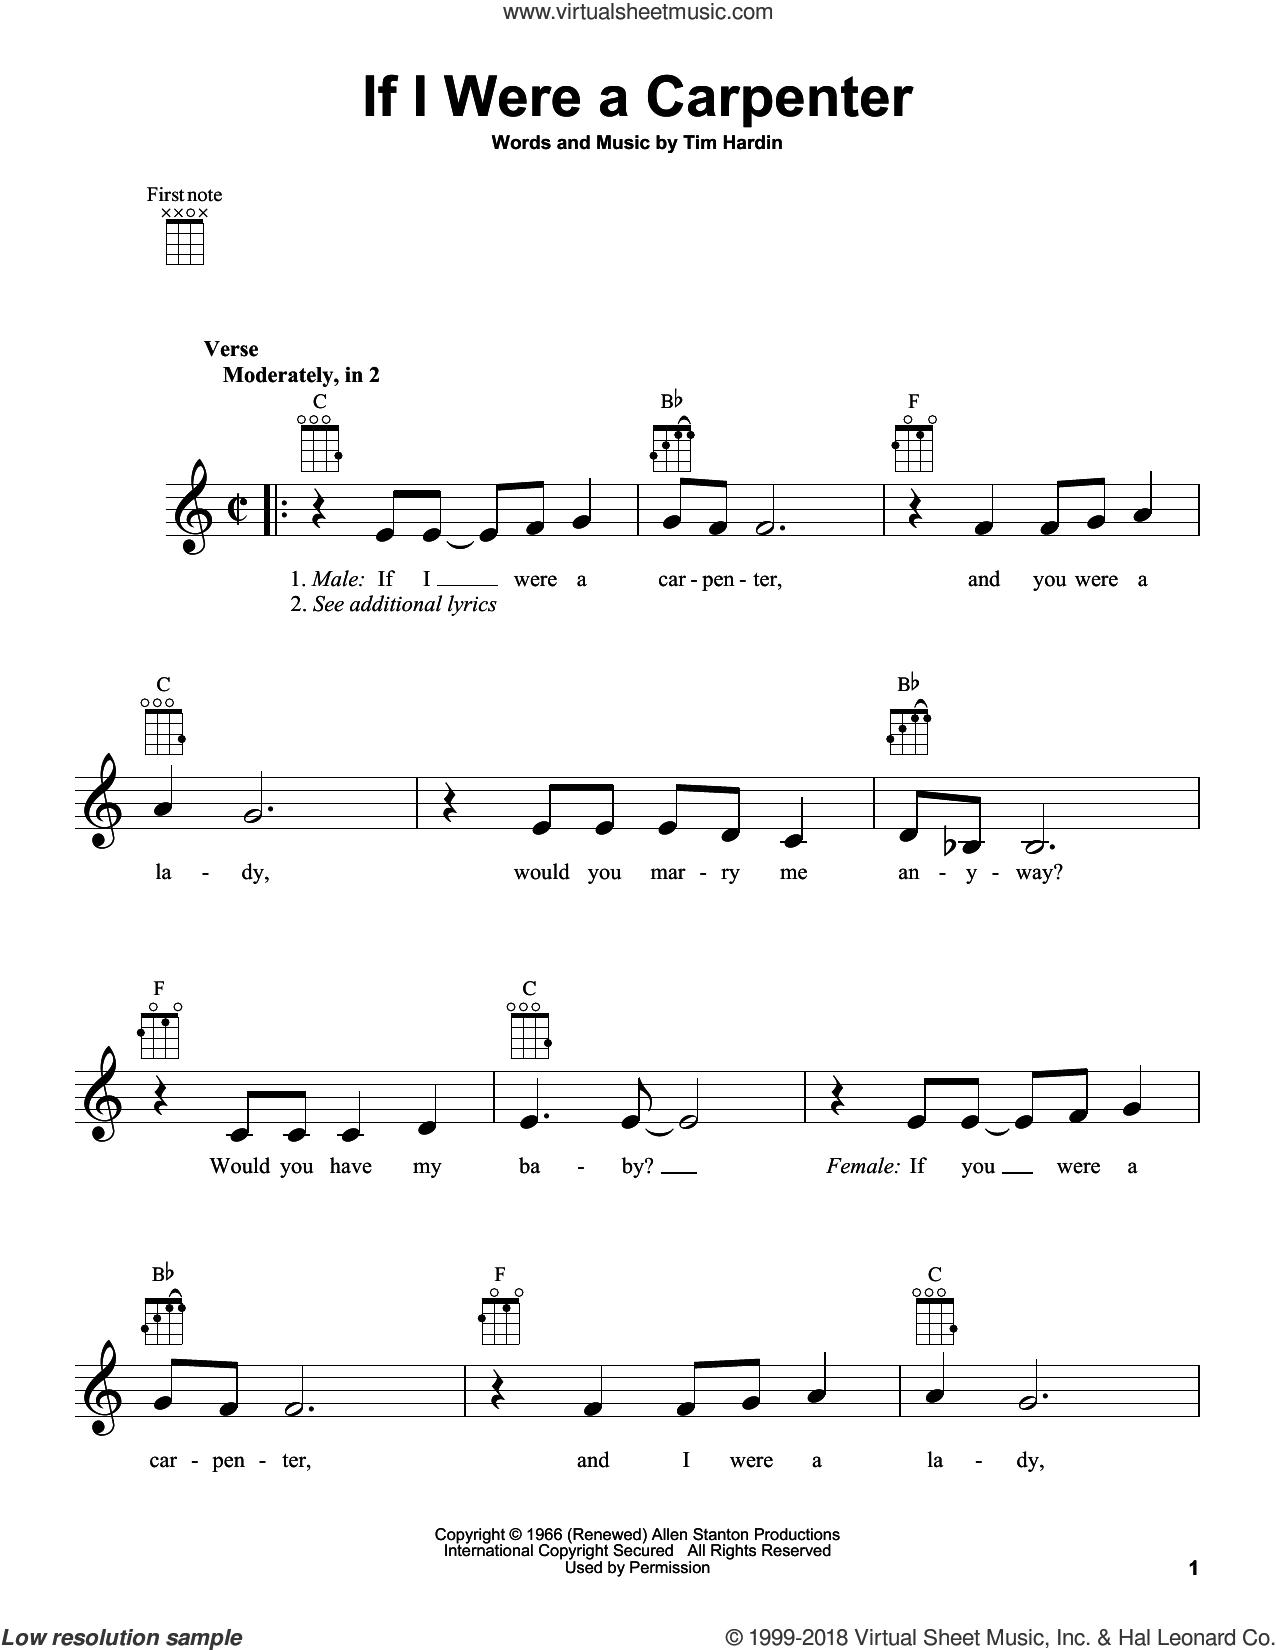 If I Were A Carpenter sheet music for ukulele by Johnny Cash & June Carter, Bobby Darin, Johnny Cash and Tim Hardin, intermediate skill level